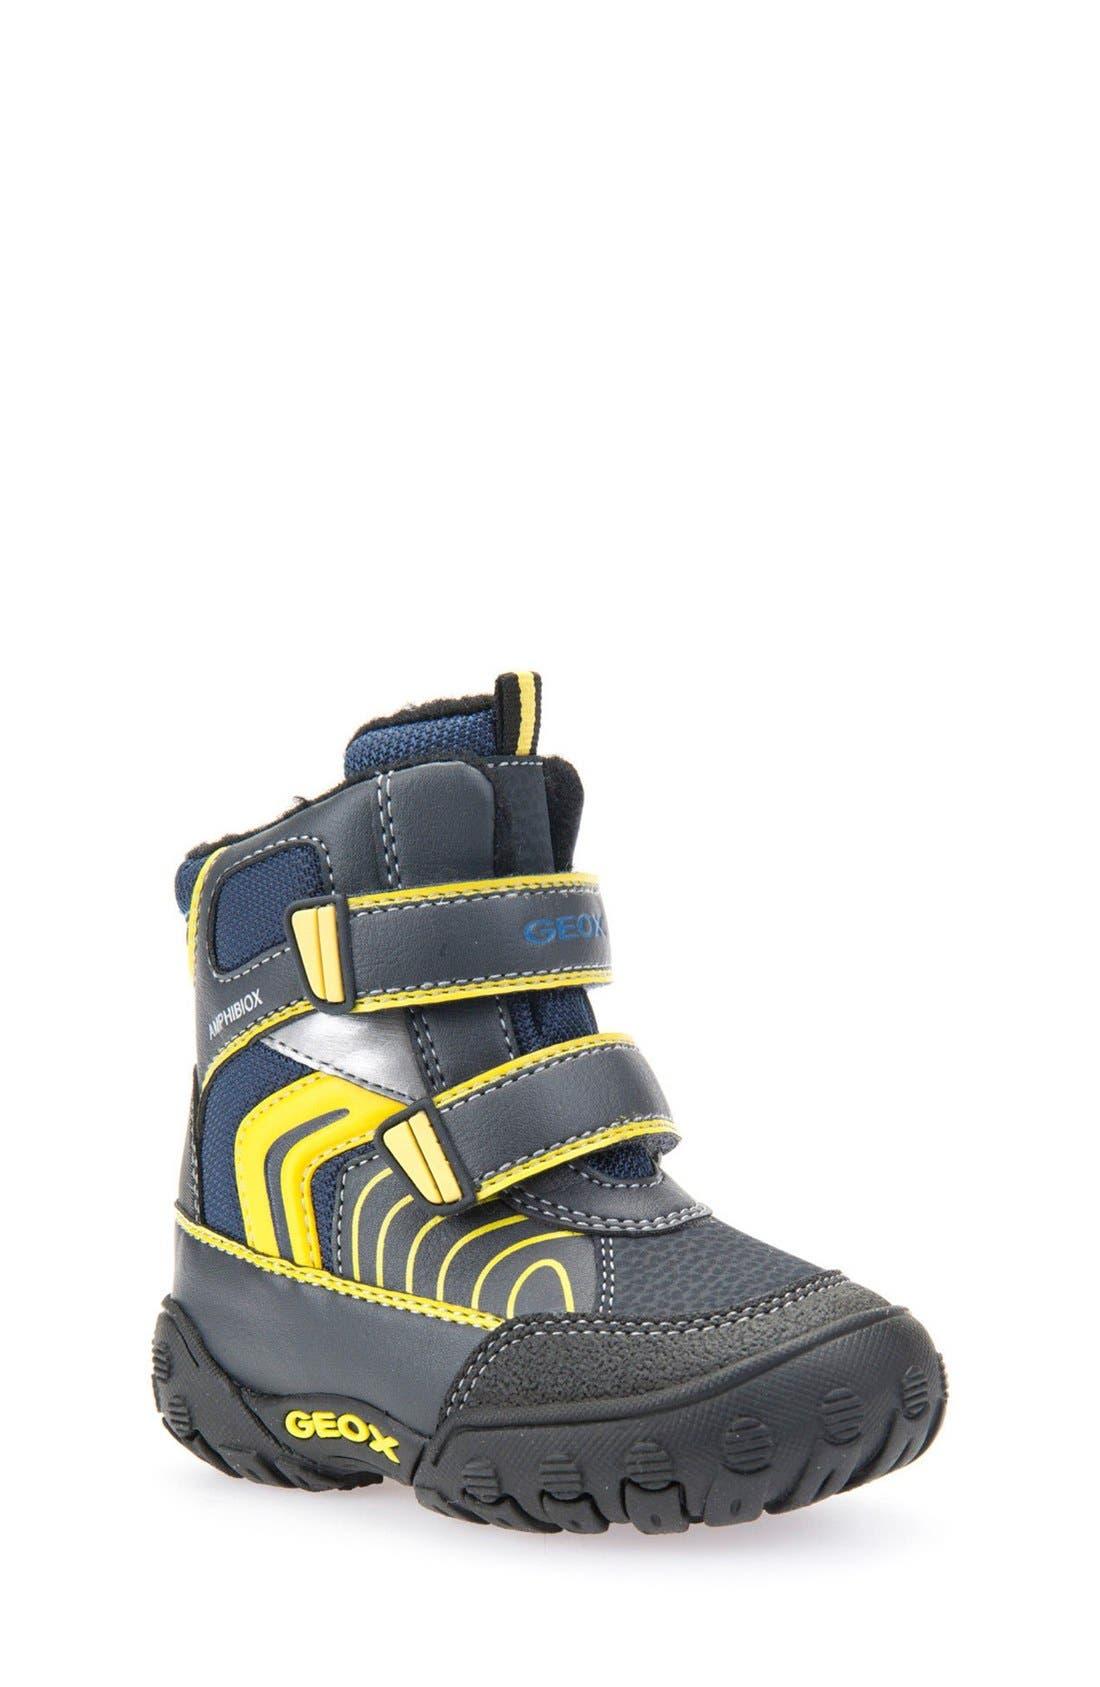 GEOX 'Gulp' Waterproof Sneaker Boot